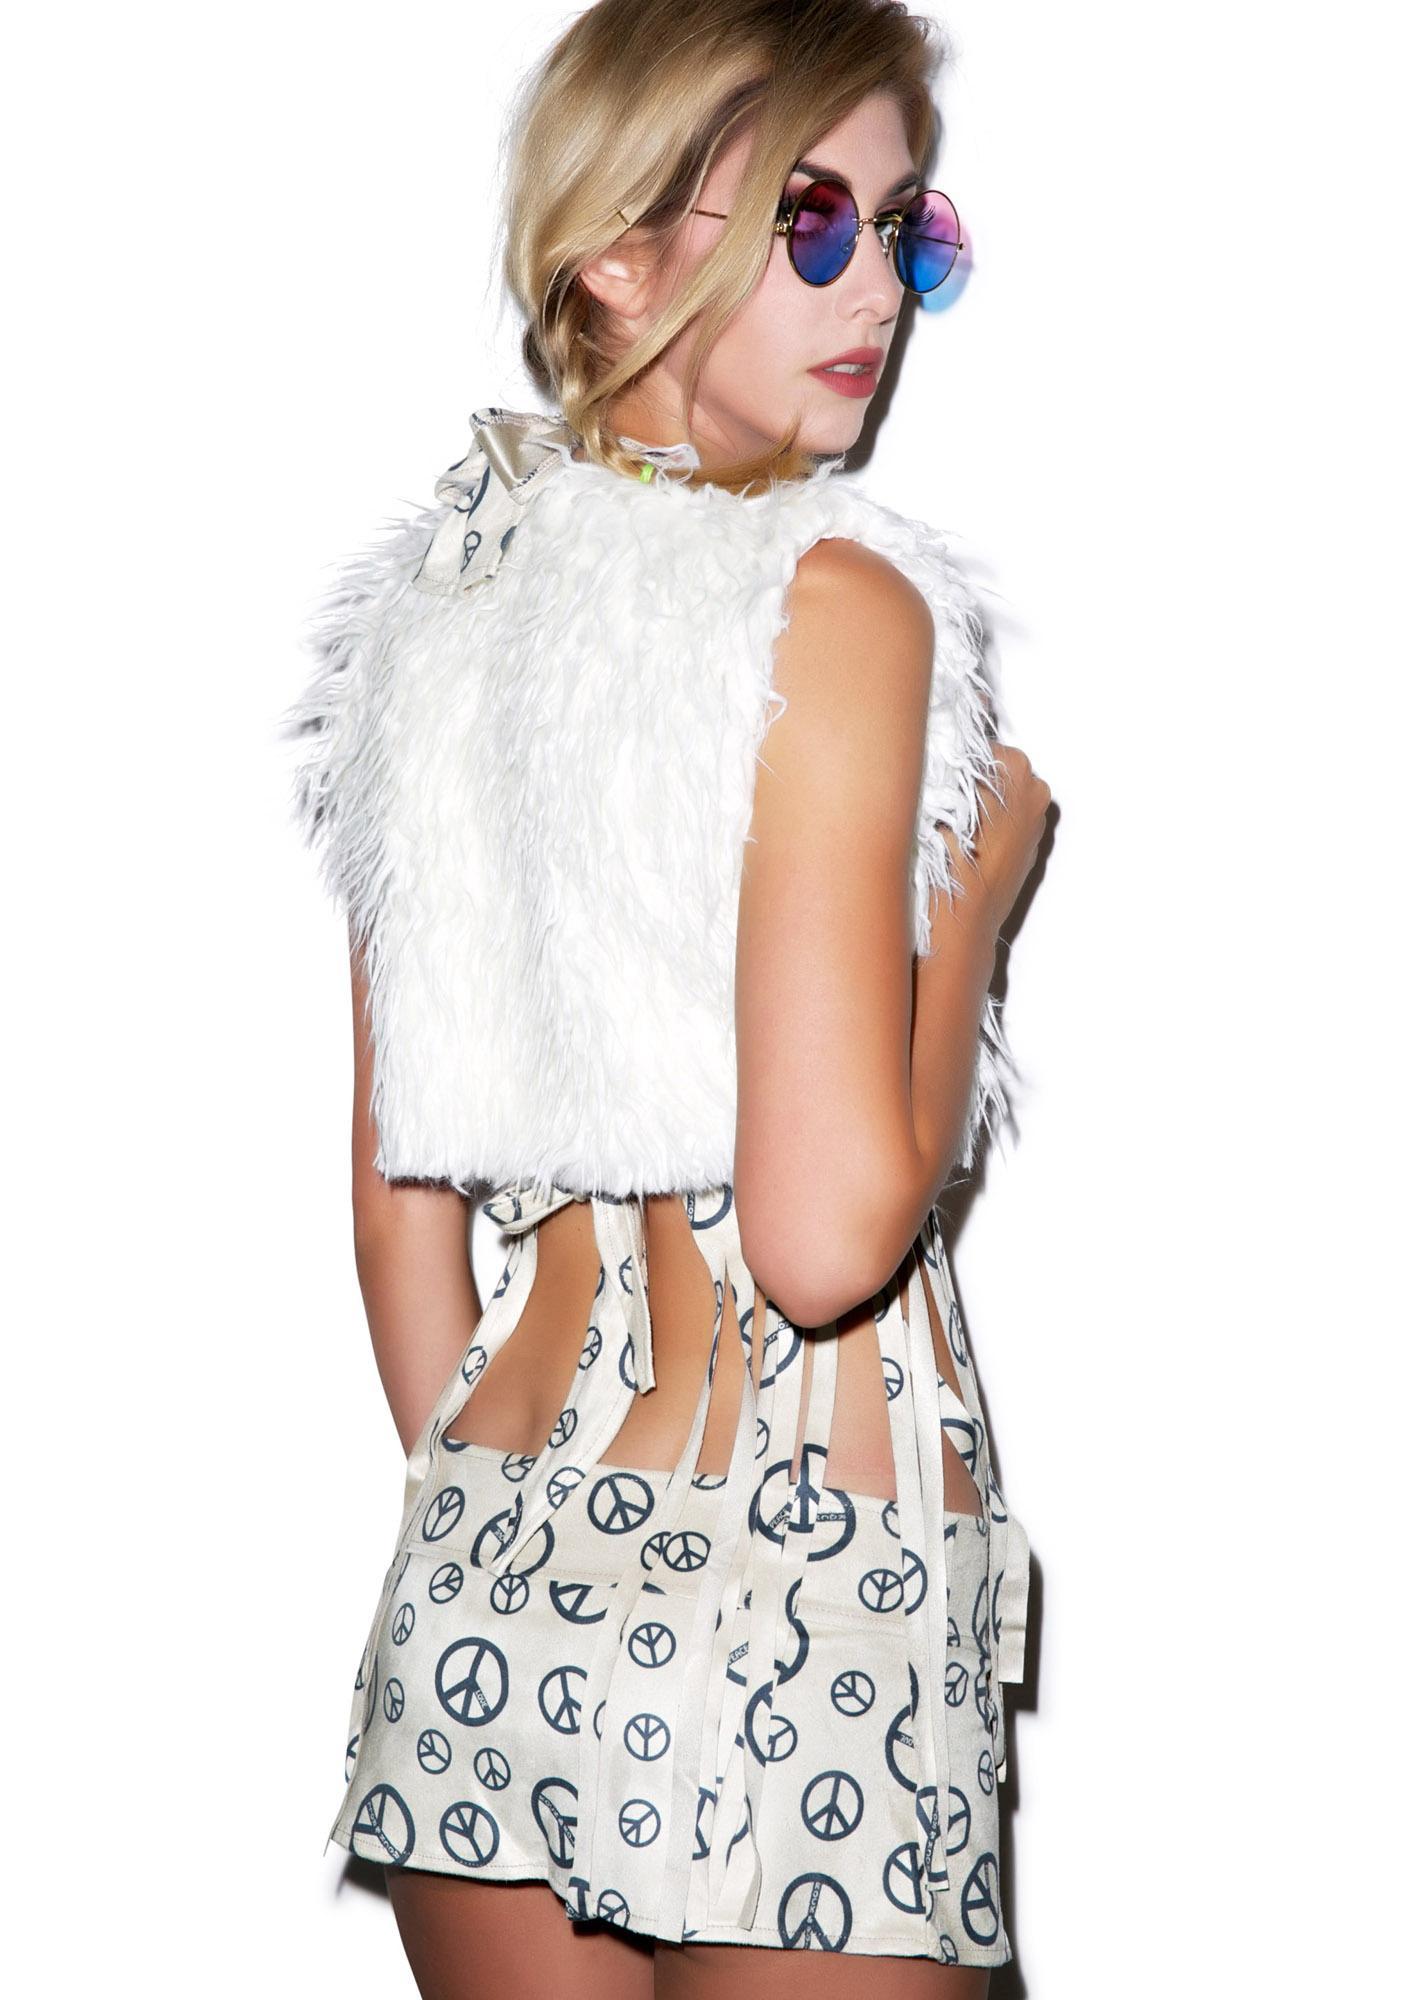 J Valentine Mohair Missy Costume